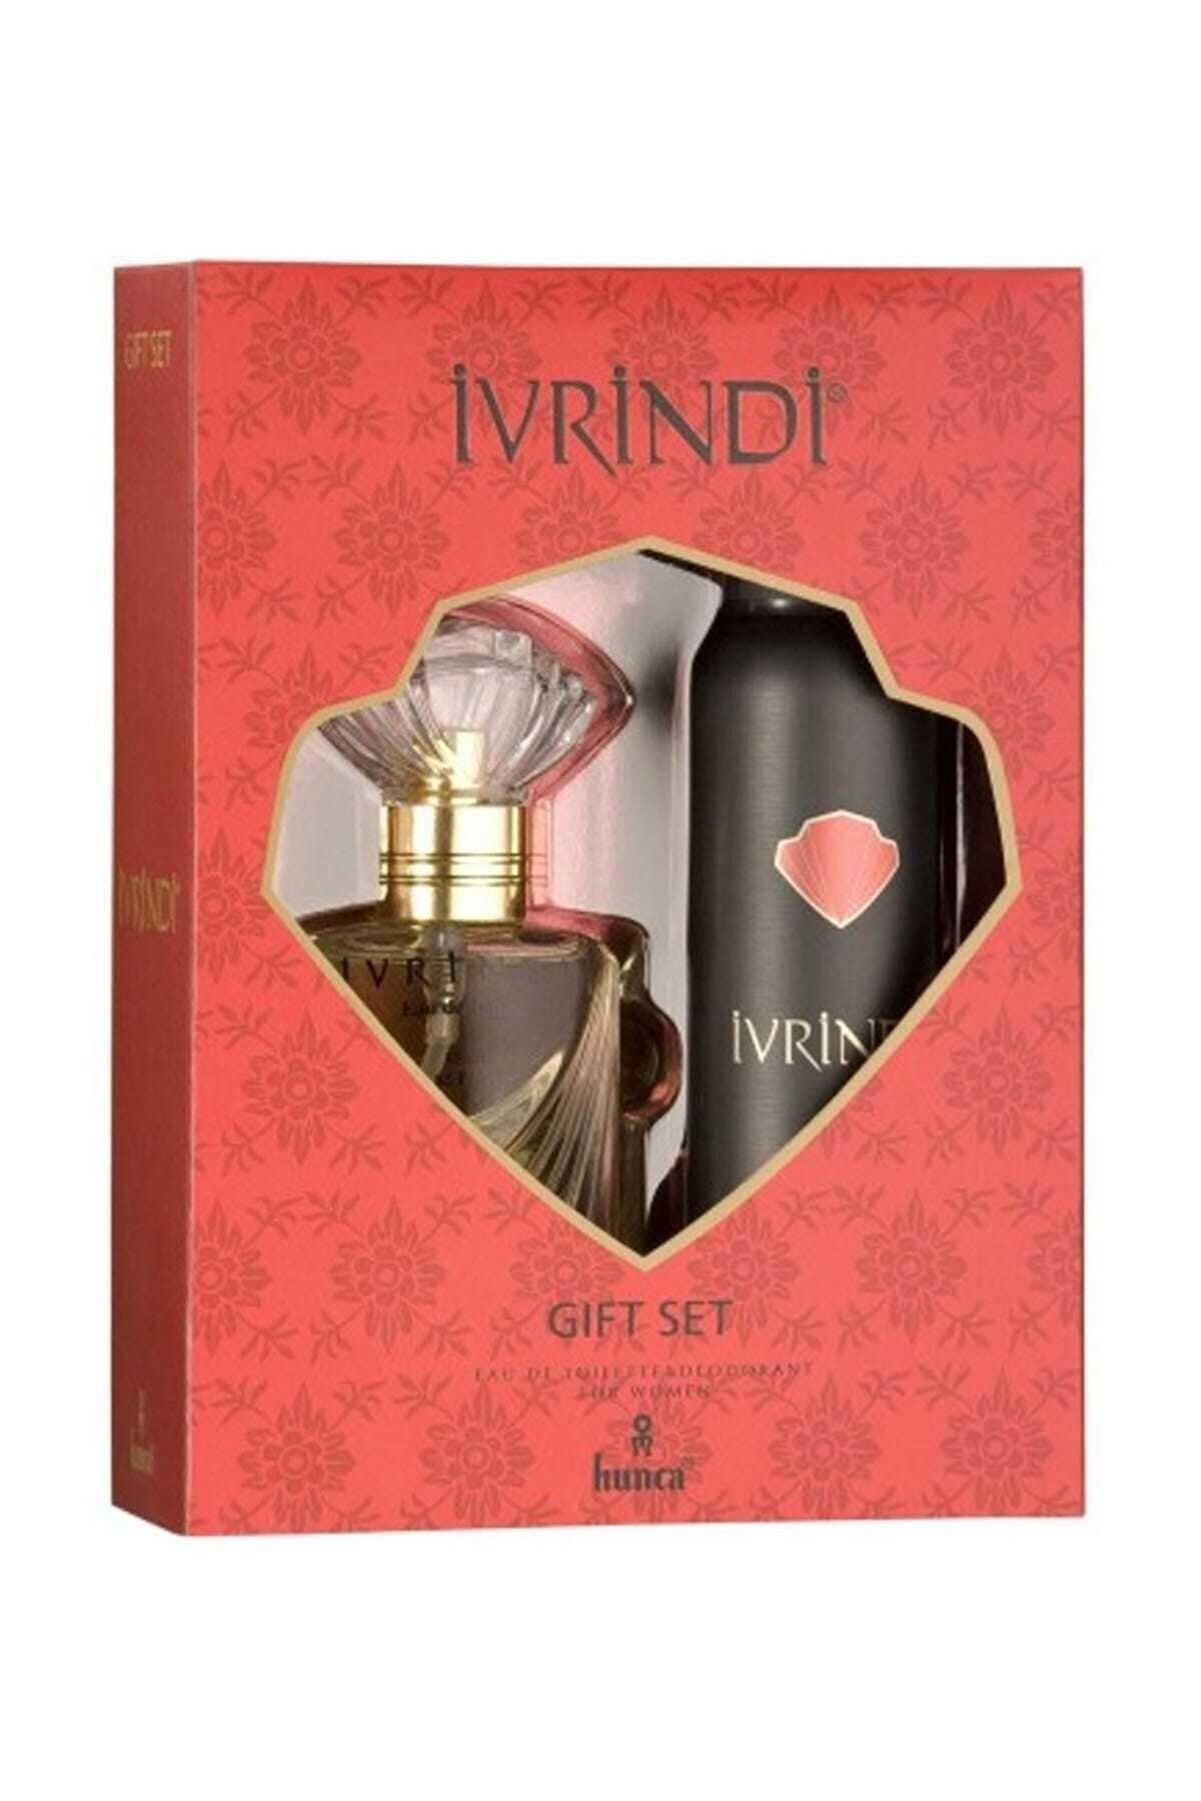 Ivrindi Edt 55 ml Deodorant 150 ml Kadın Parfüm Seti 8690973040879